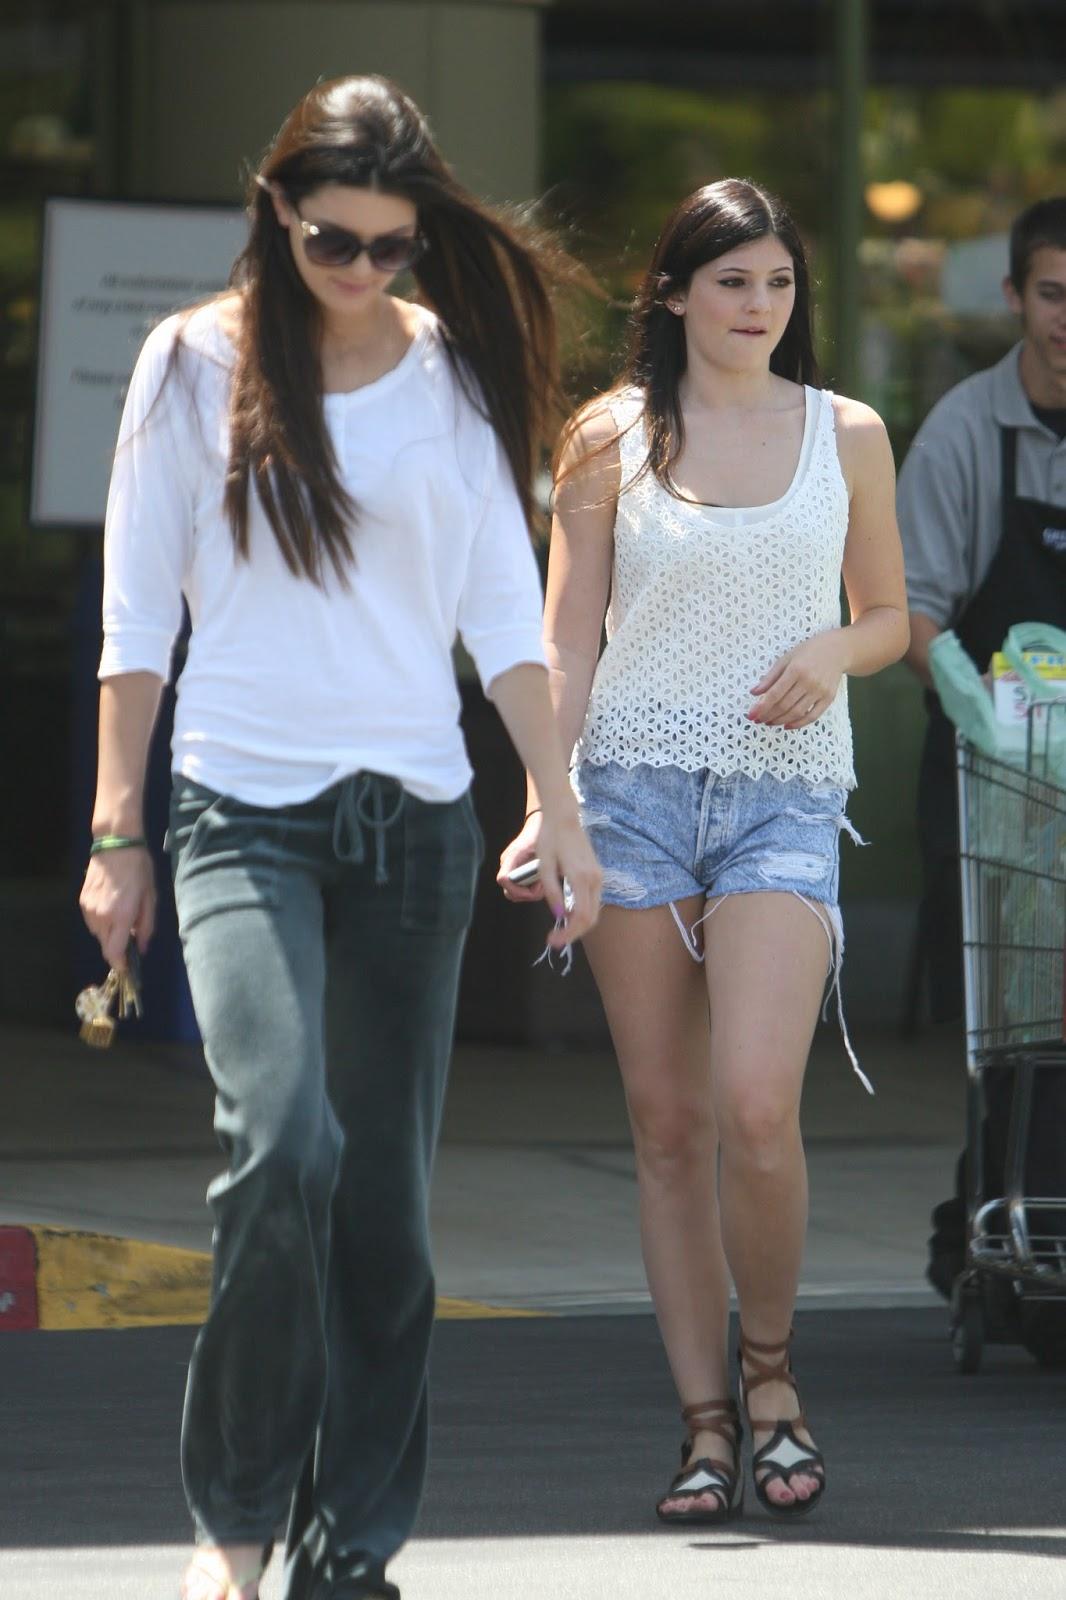 http://4.bp.blogspot.com/-mC4-mMb8xfU/Tv9MpzOk0pI/AAAAAAAAUlE/y2REwO4QZsk/s1600/Kendall+Jenner+and+Kylie+Jenner+Dress+Their+Age%252C+Not+Like+Kim+Kardashian+1.jpg